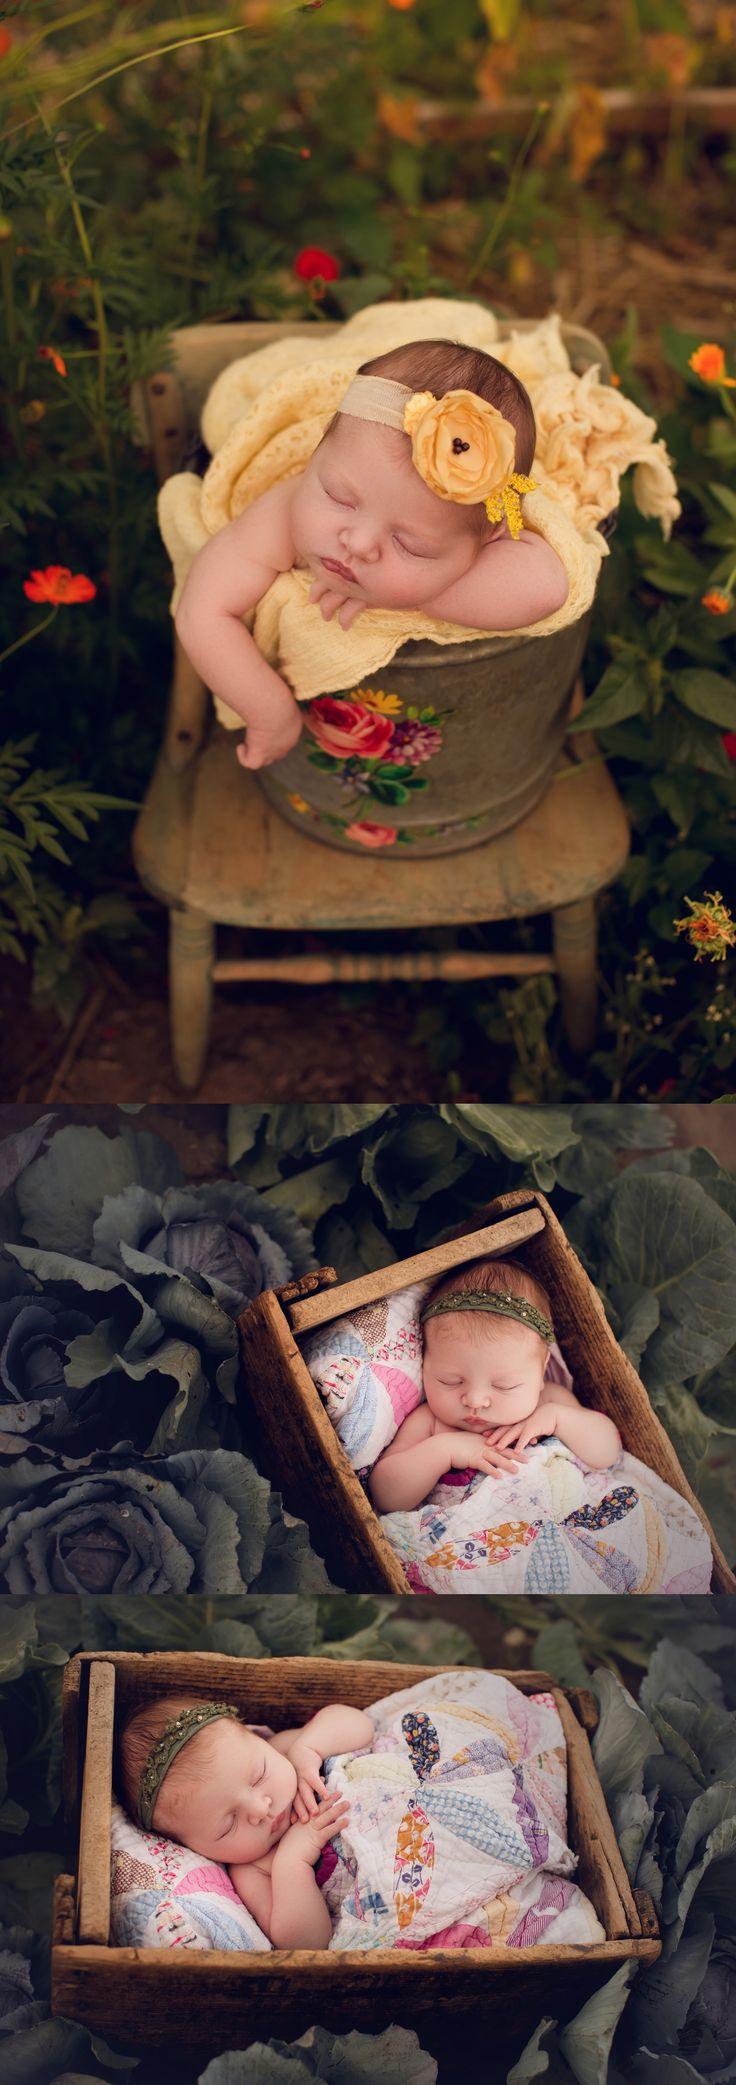 Portland OR newborn photographer, Portland Oregon newborn photography, Vancouver WA newborn photography